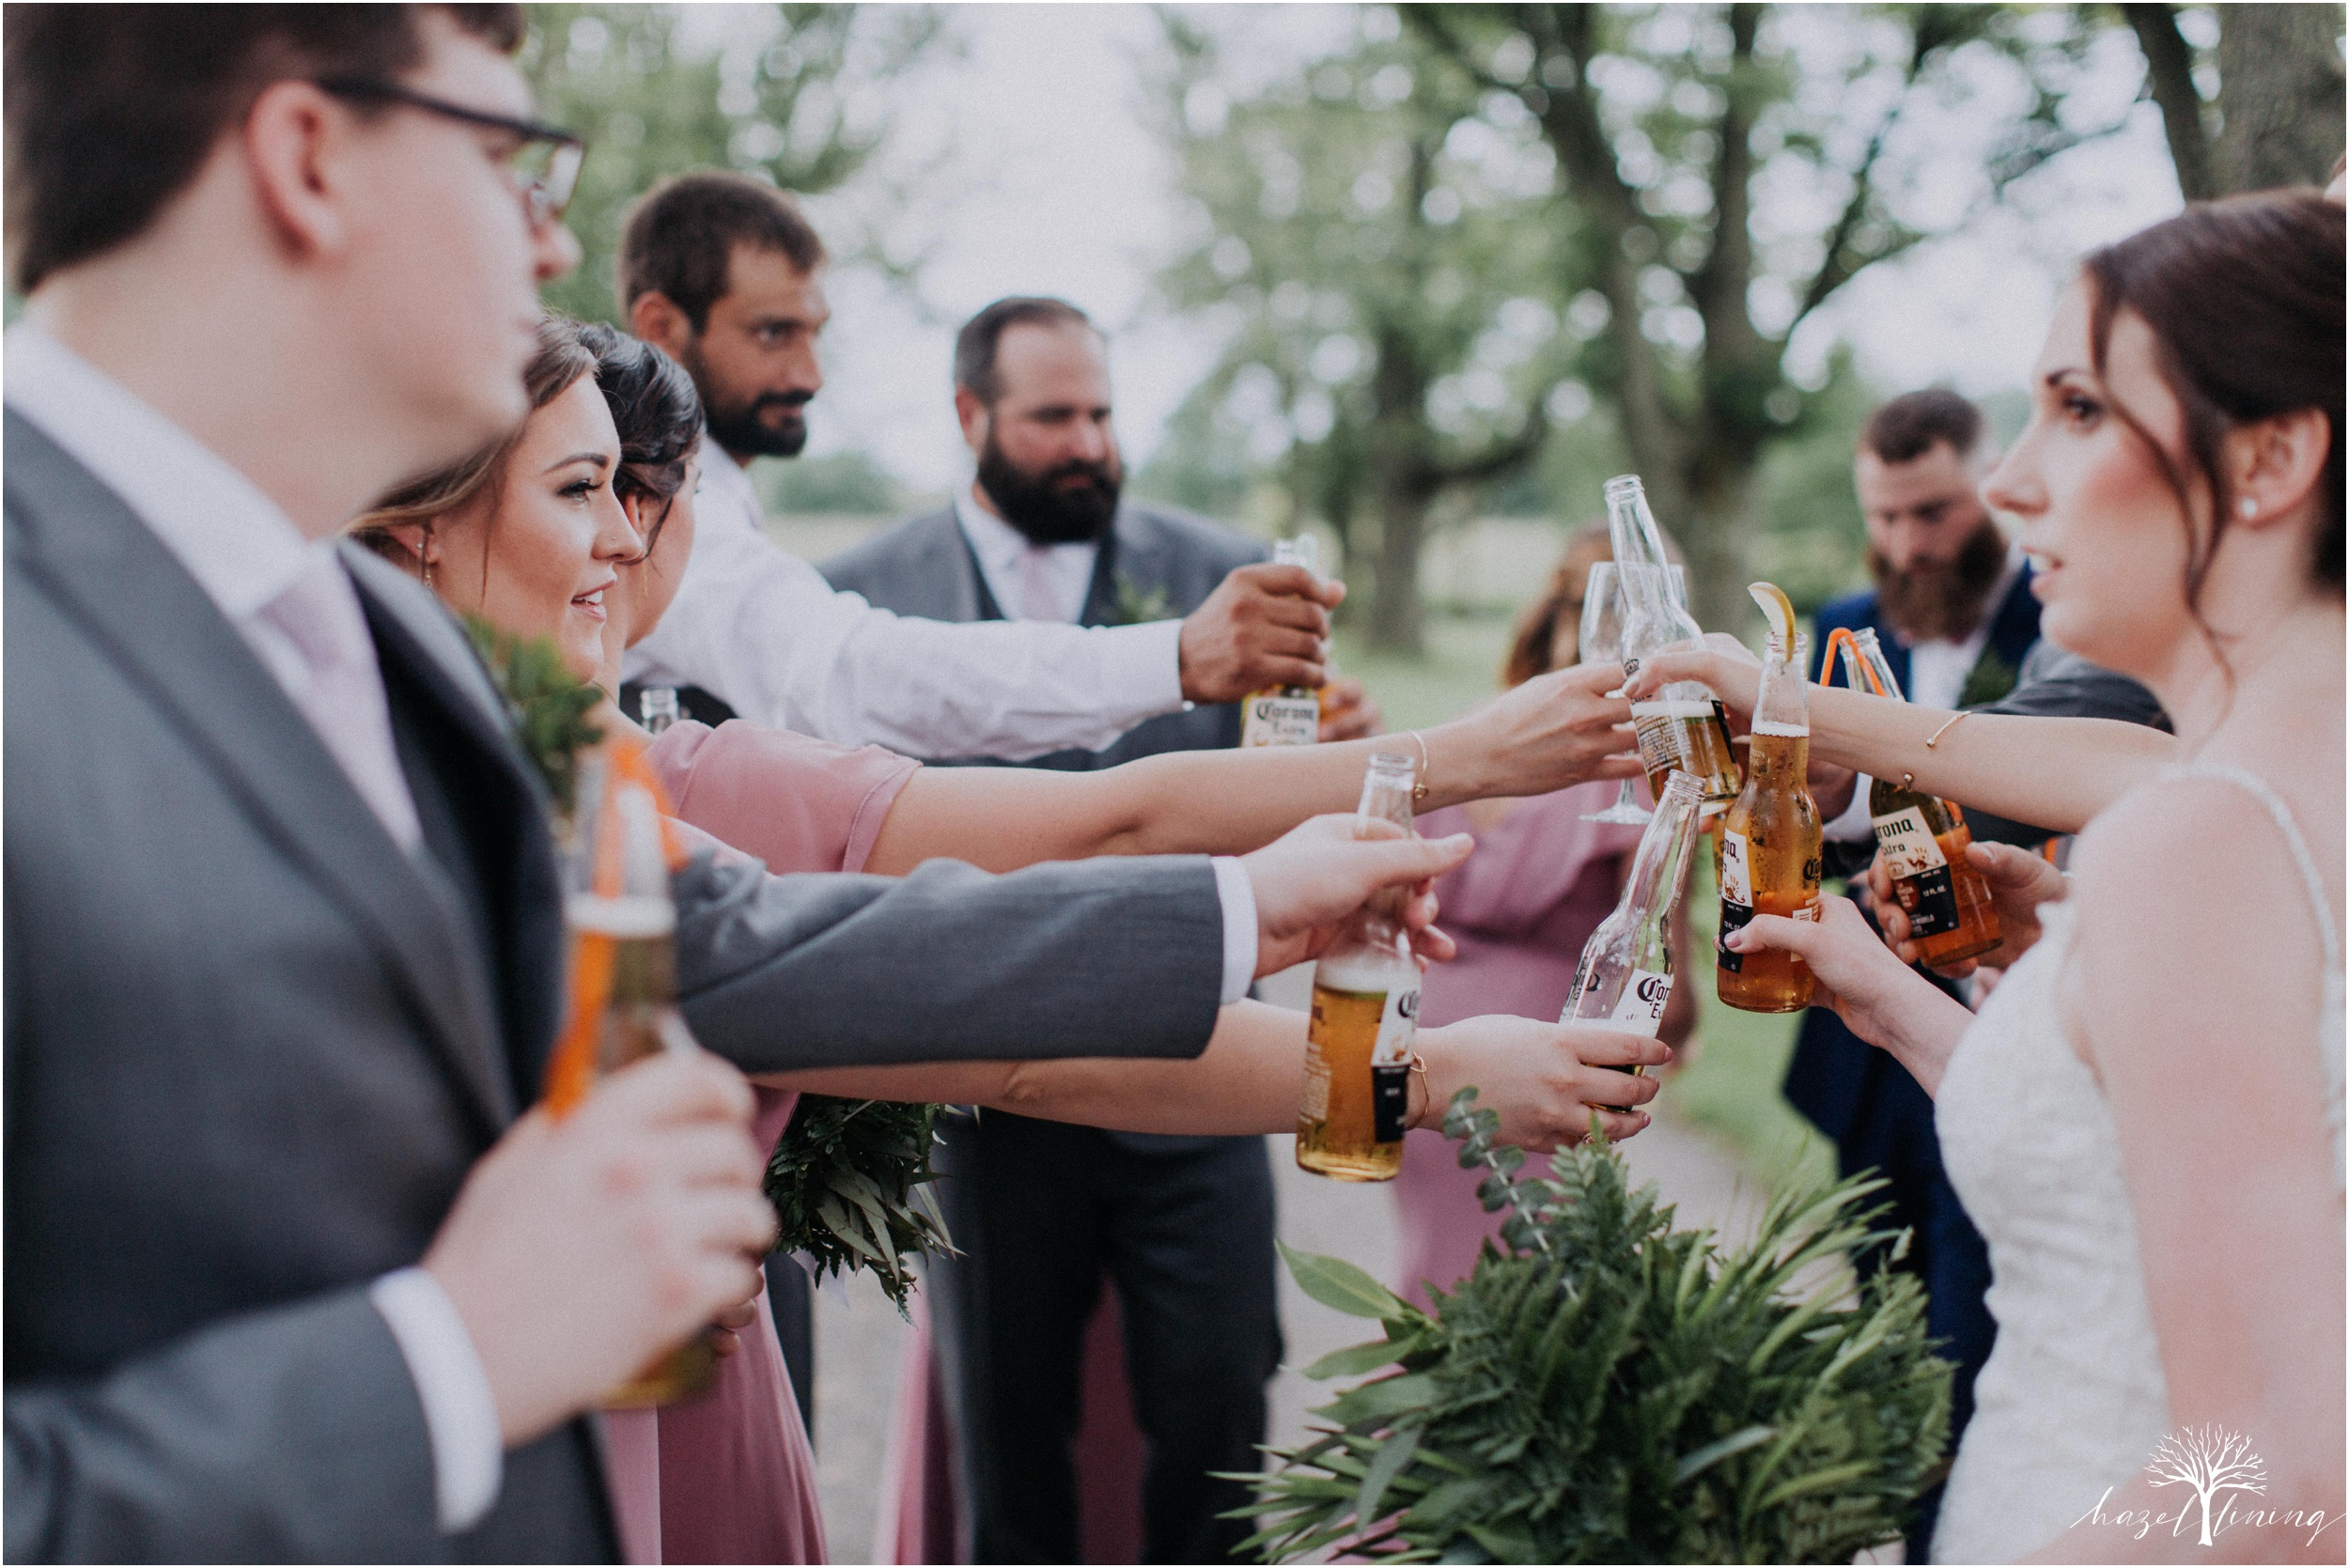 hazel-lining-travel-wedding-elopement-photography-lisa-landon-shoemaker-the-farm-bakery-and-events-bucks-county-quakertown-pennsylvania-summer-country-outdoor-farm-wedding_0105.jpg